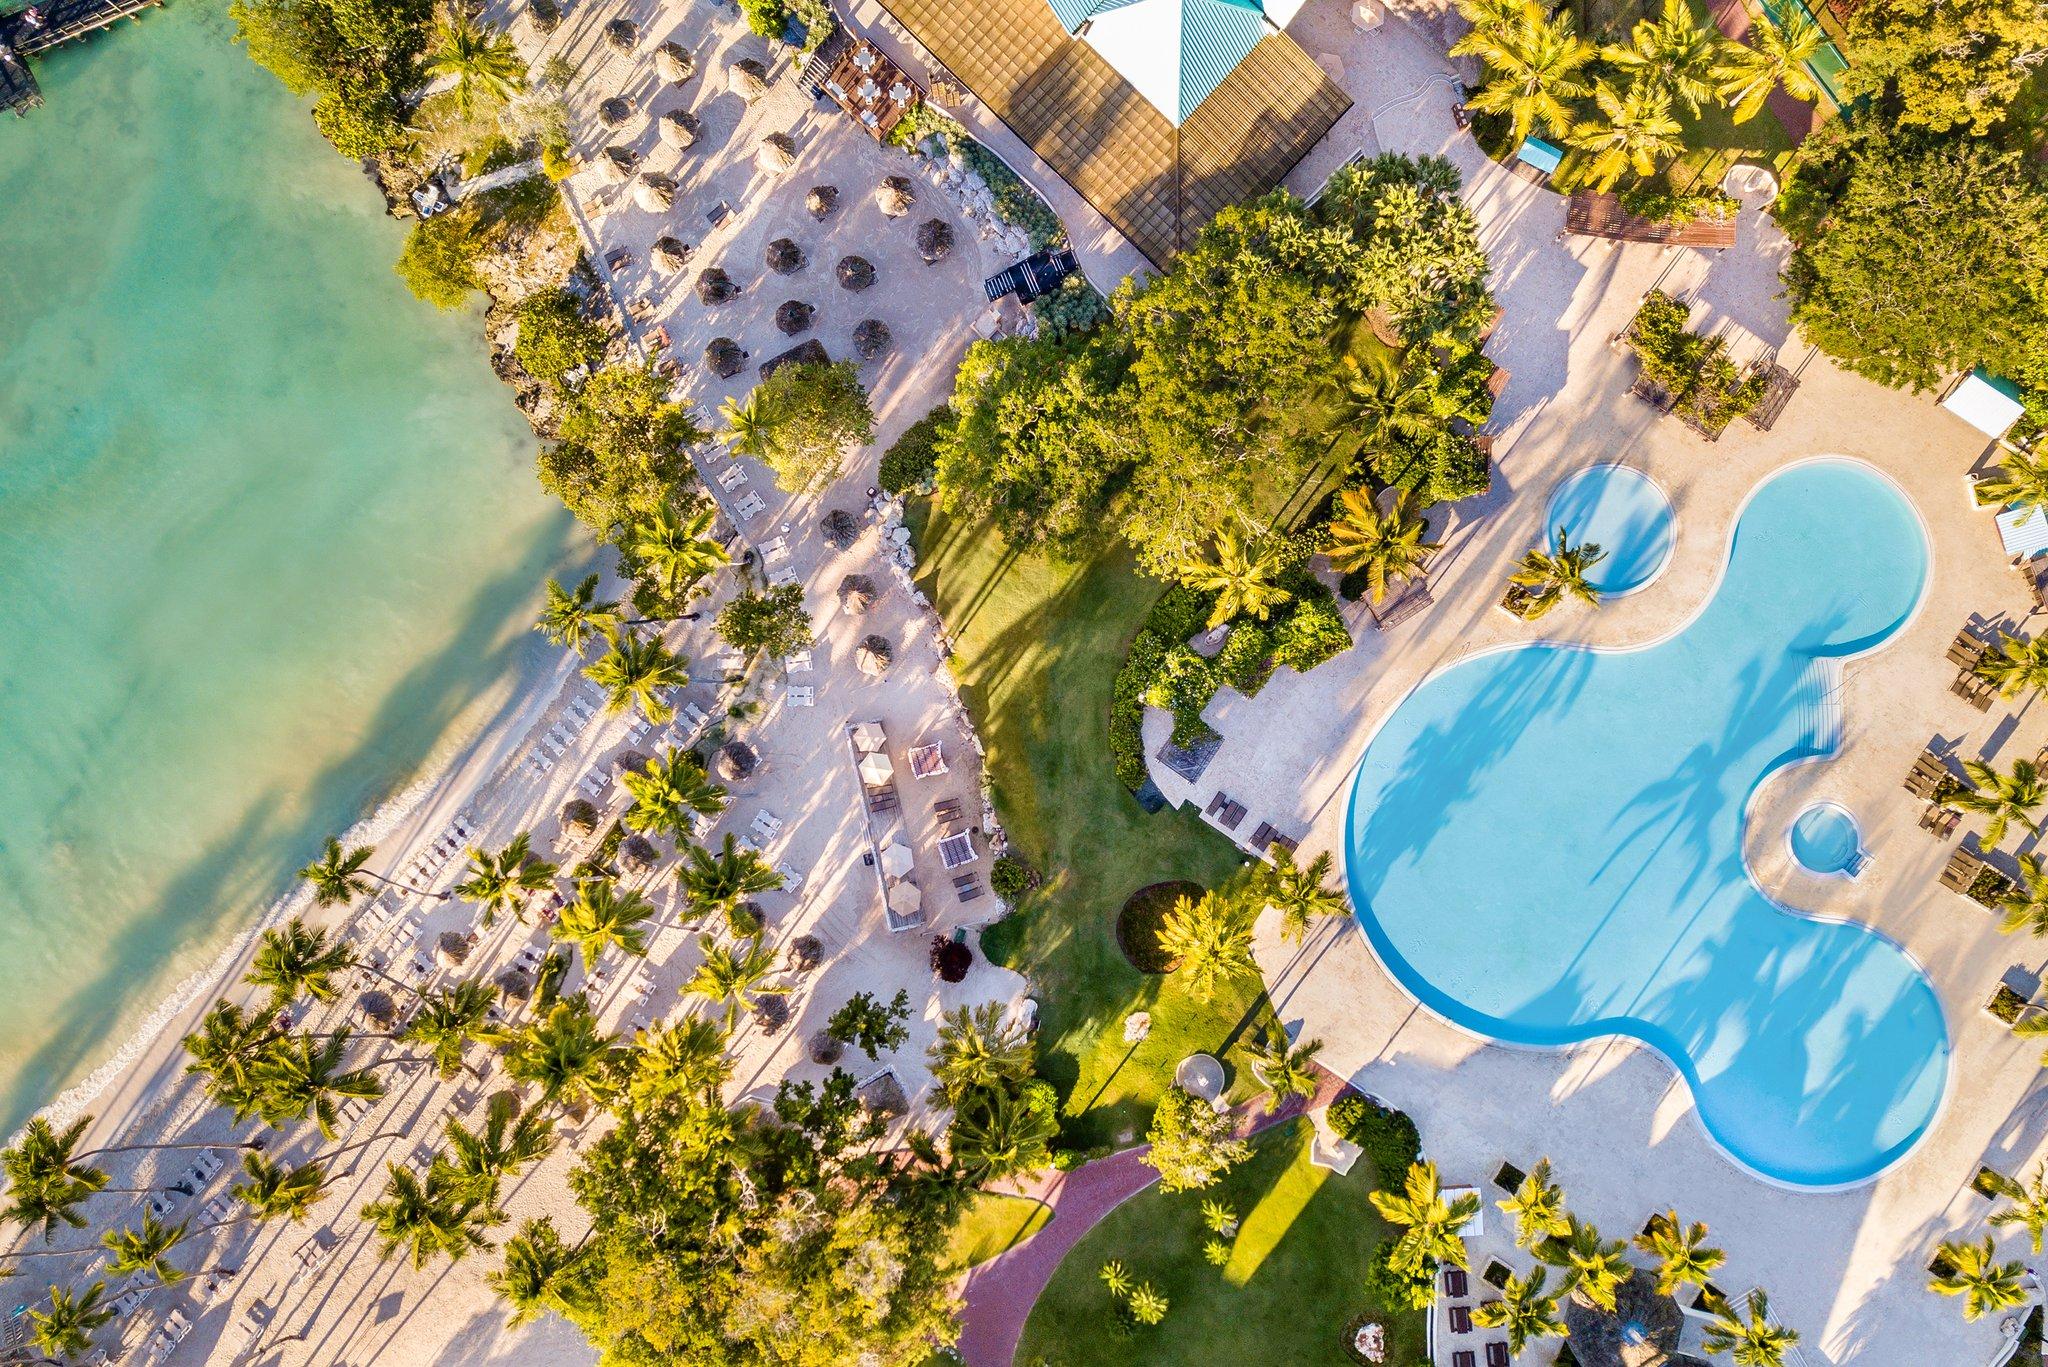 Hilton La Romana, an All-Inclusive Adult